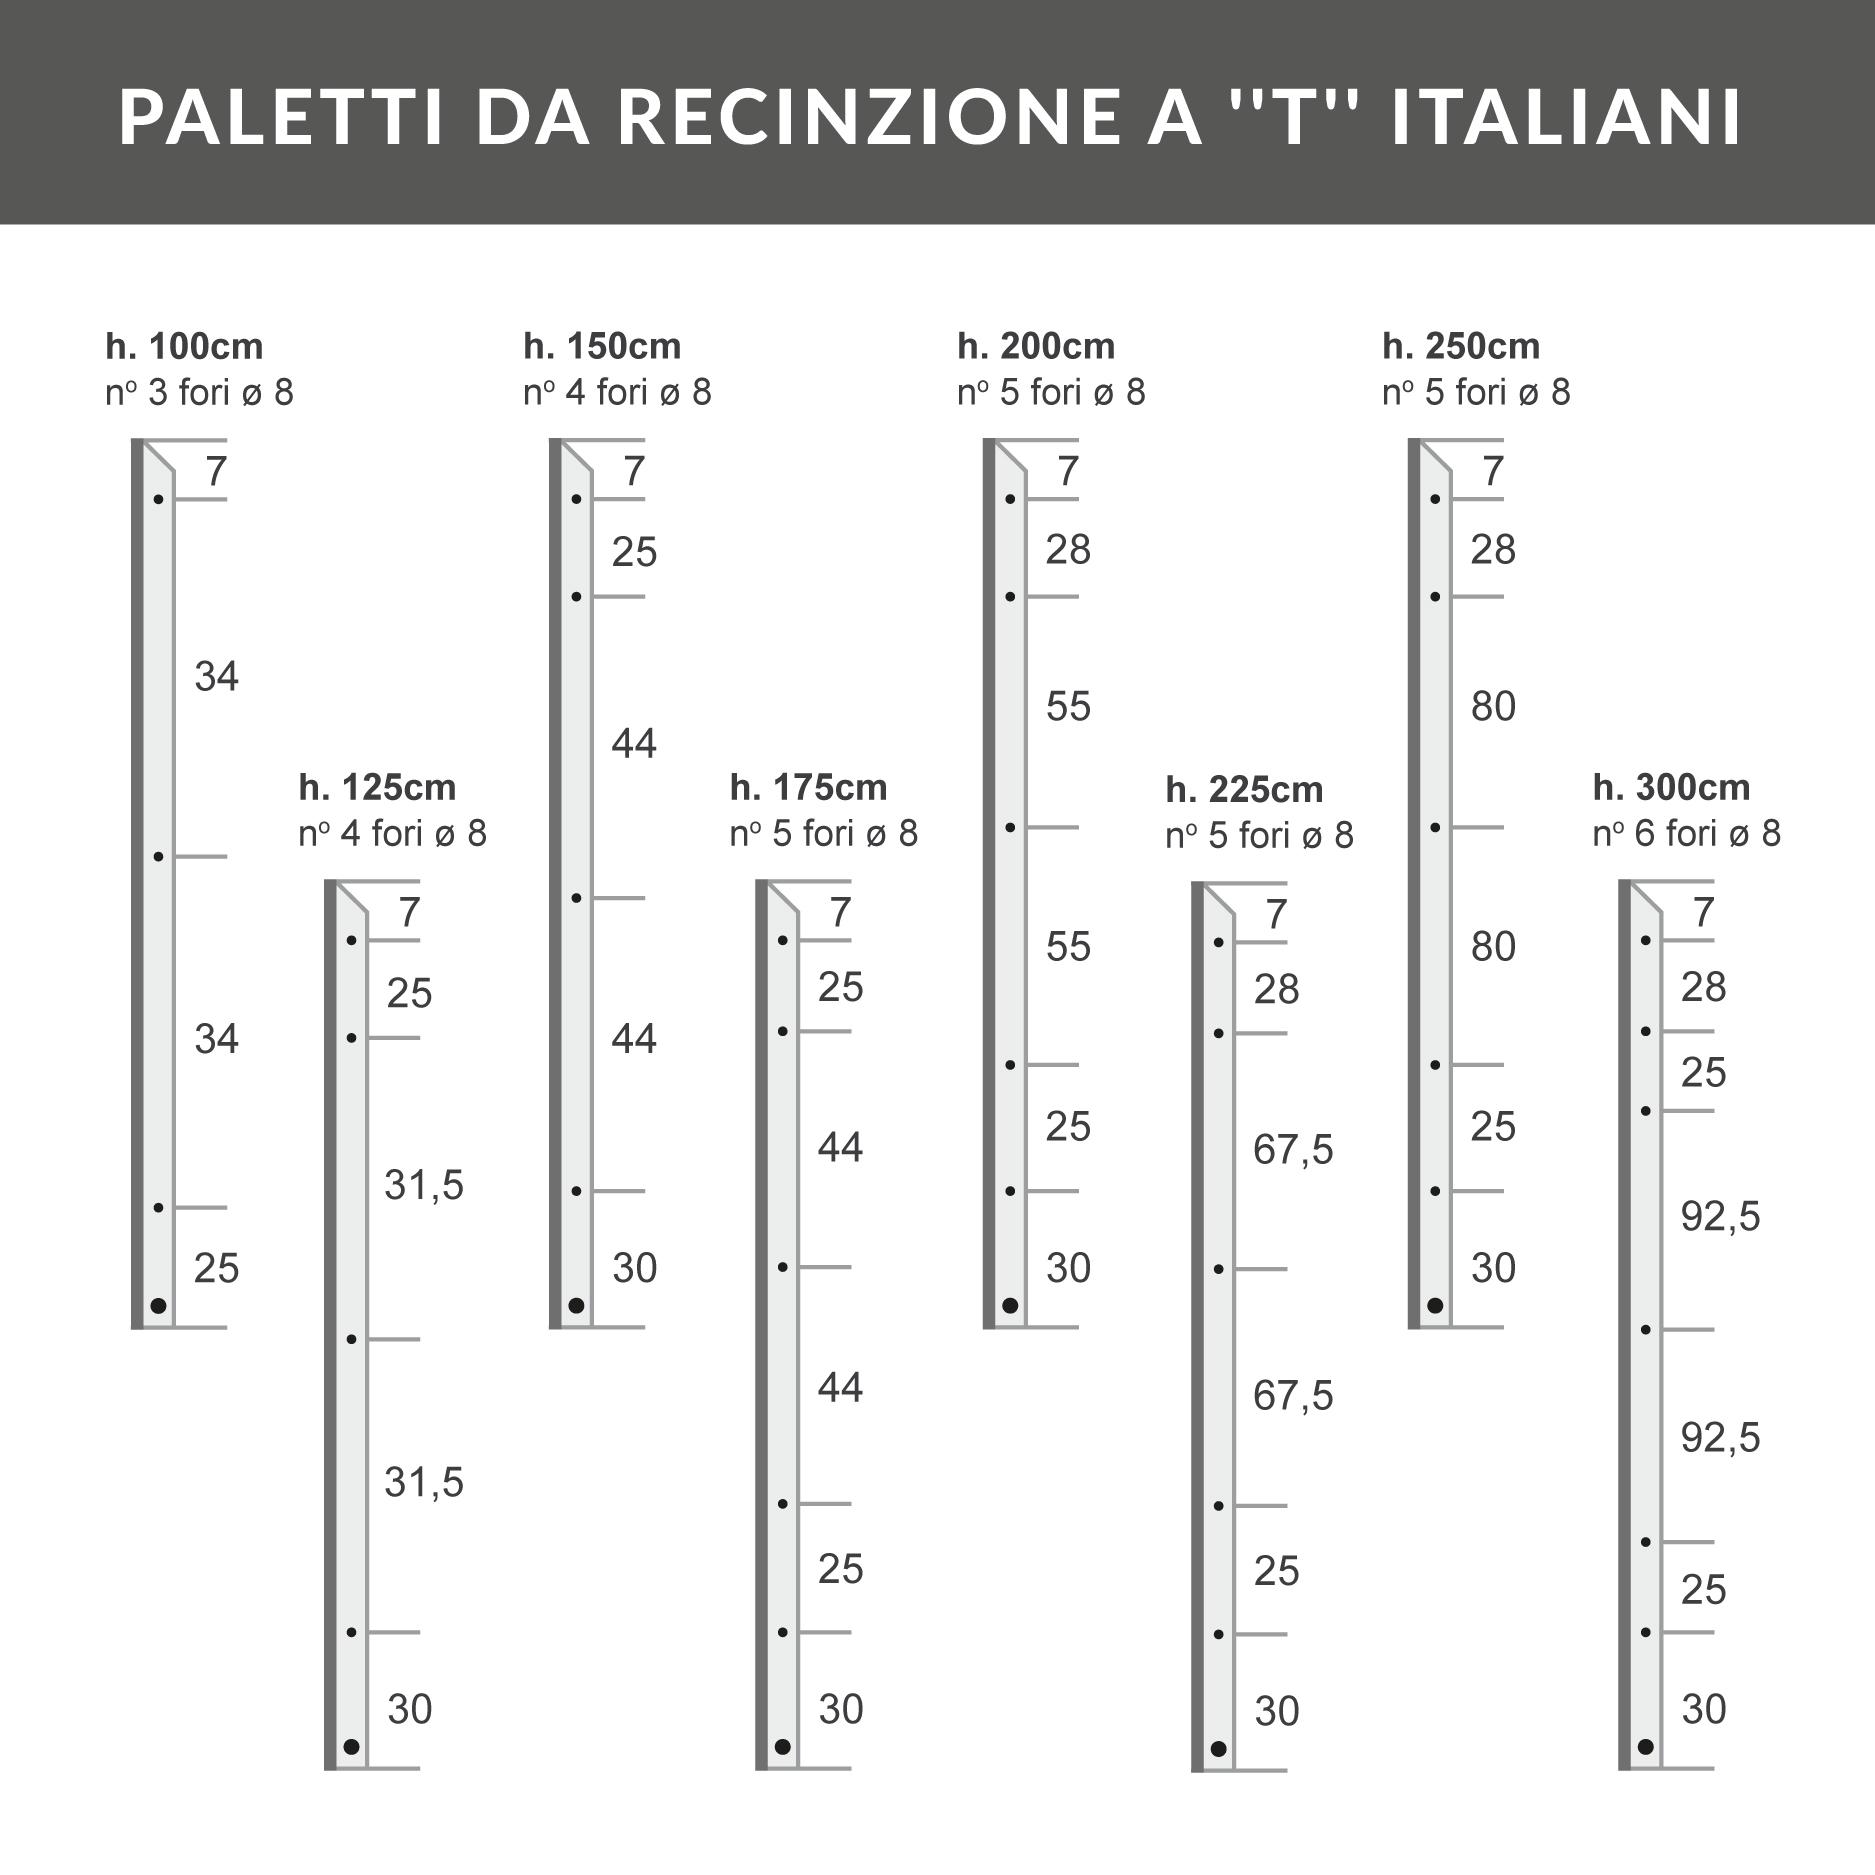 paletti-da-recinzione-a-t-italiani-04.pn